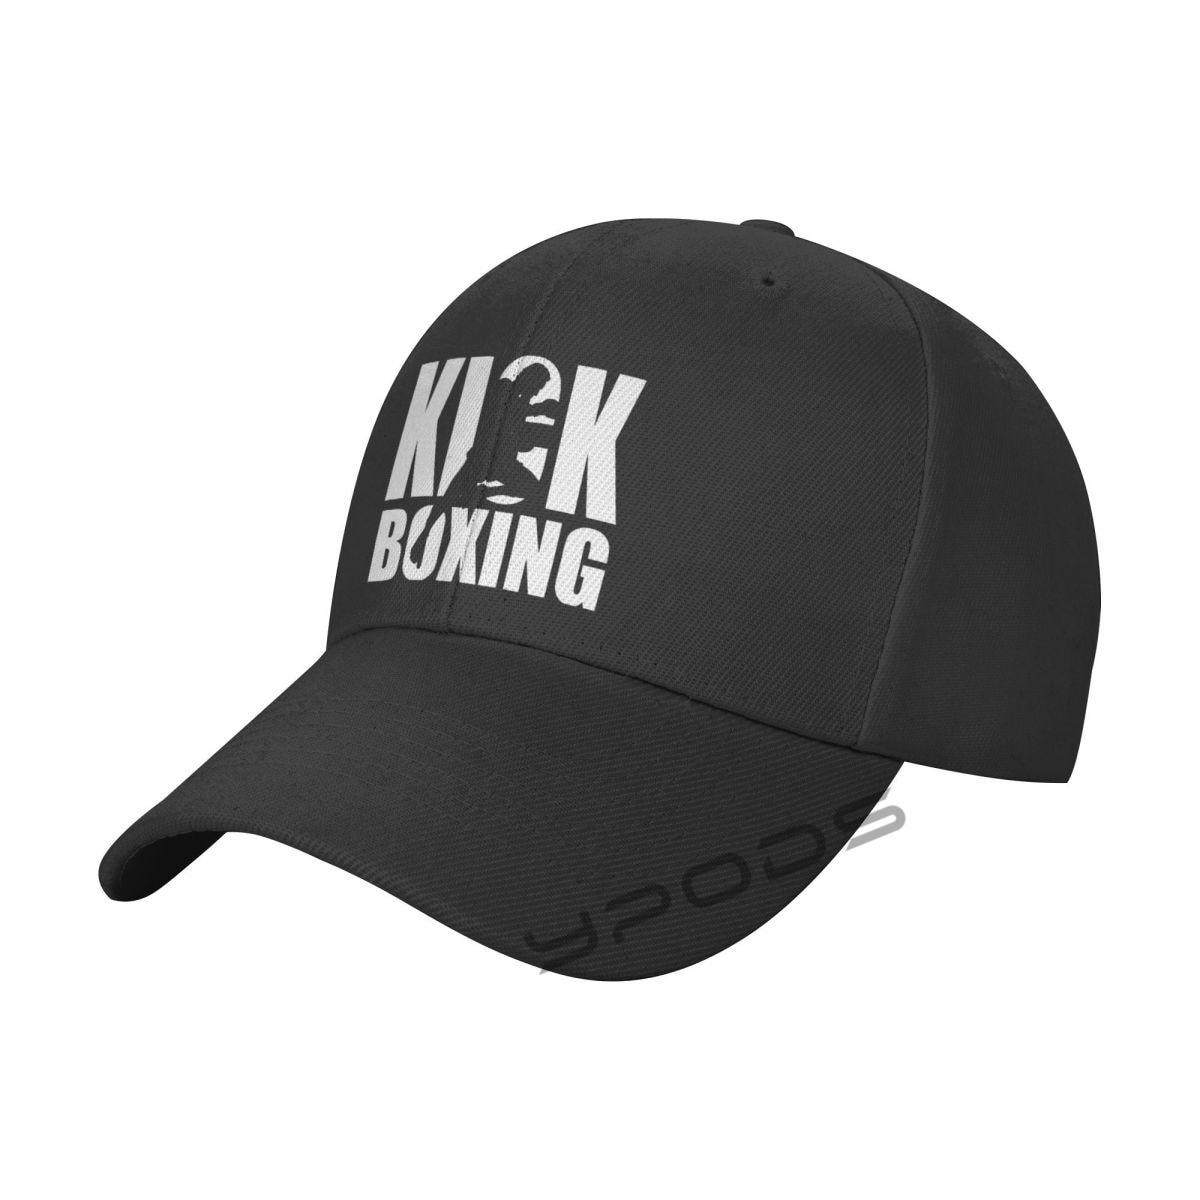 Новинка, бейсболка Kick Boxinger, кепка для мужчин и женщин, мужская Кепка, Снэпбэк Кепка, повседневная Кепка, кепка, шапки